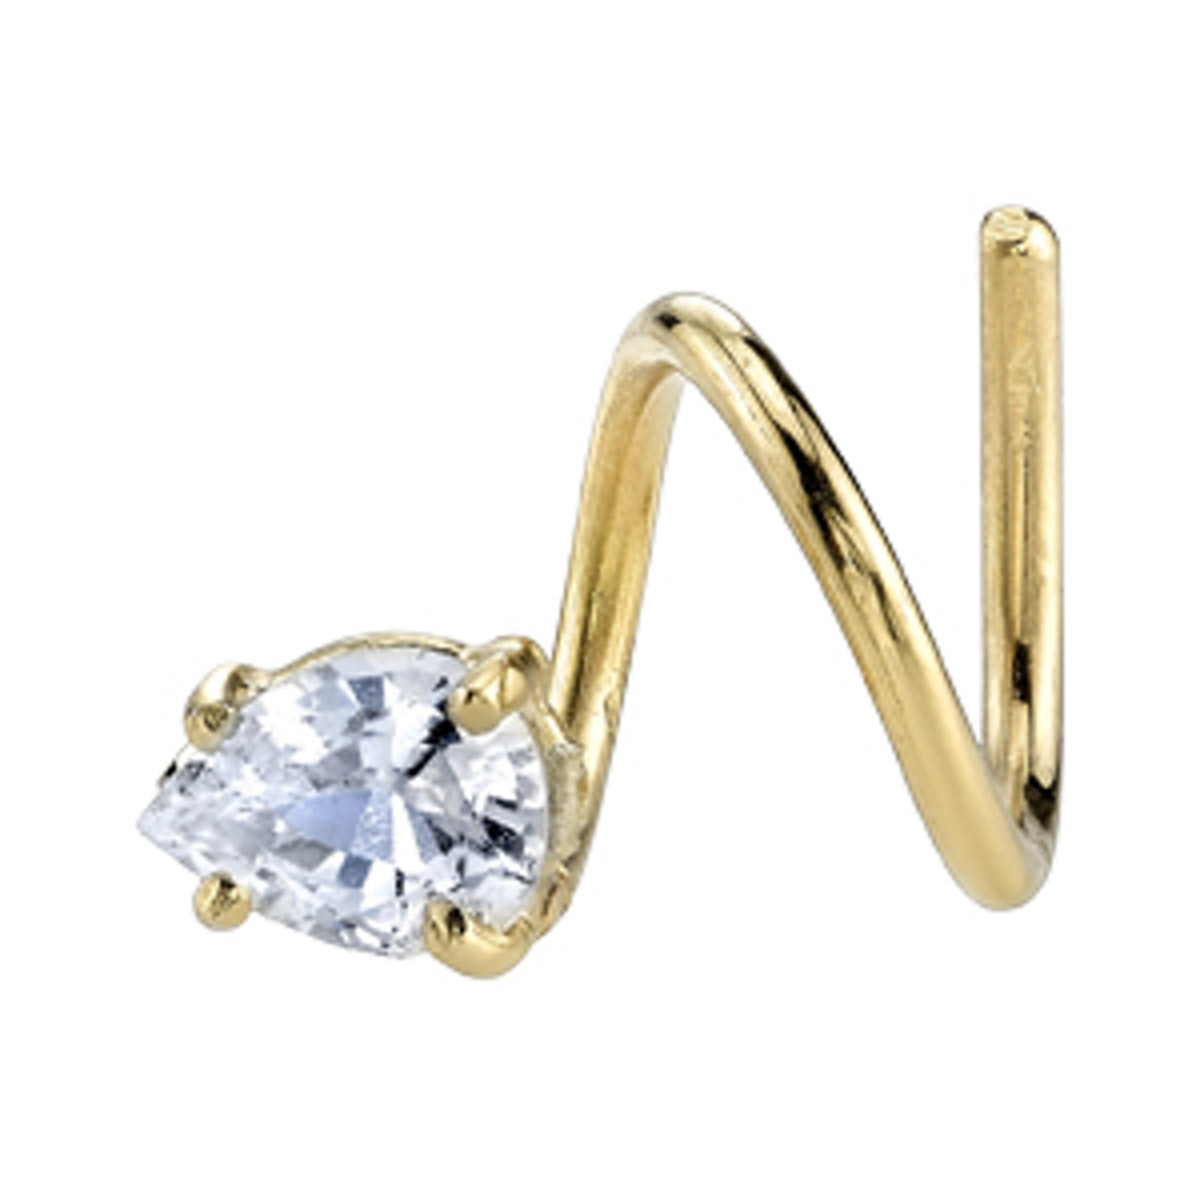 White Sapphire Pear Spiral Earring